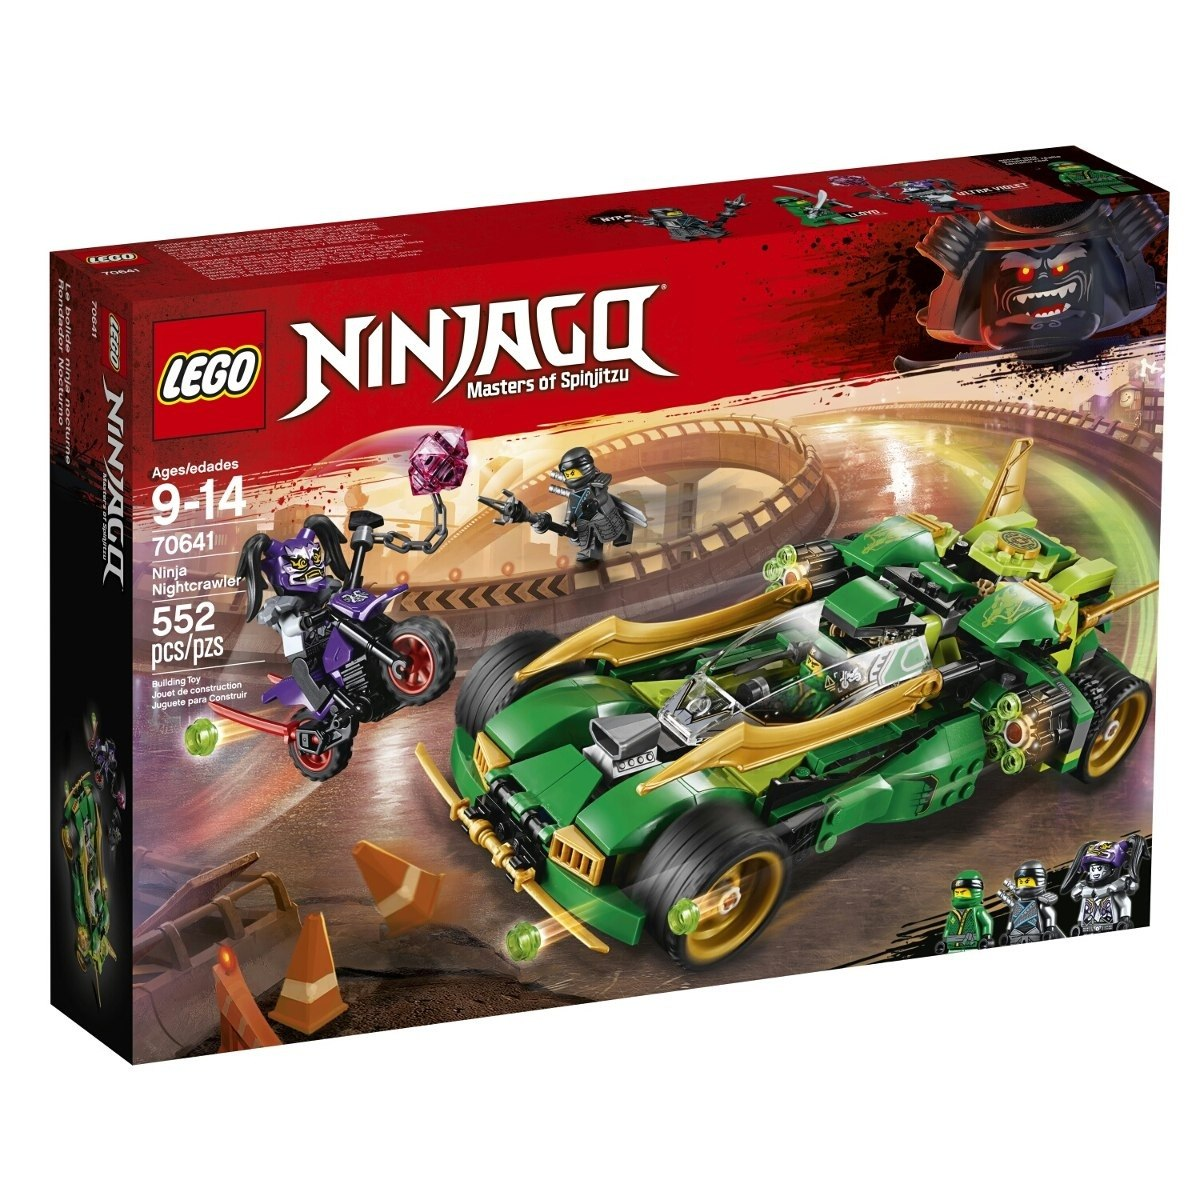 Lego 70641 Ninjago: Raptador Ninja Nocturno Collagekidsar